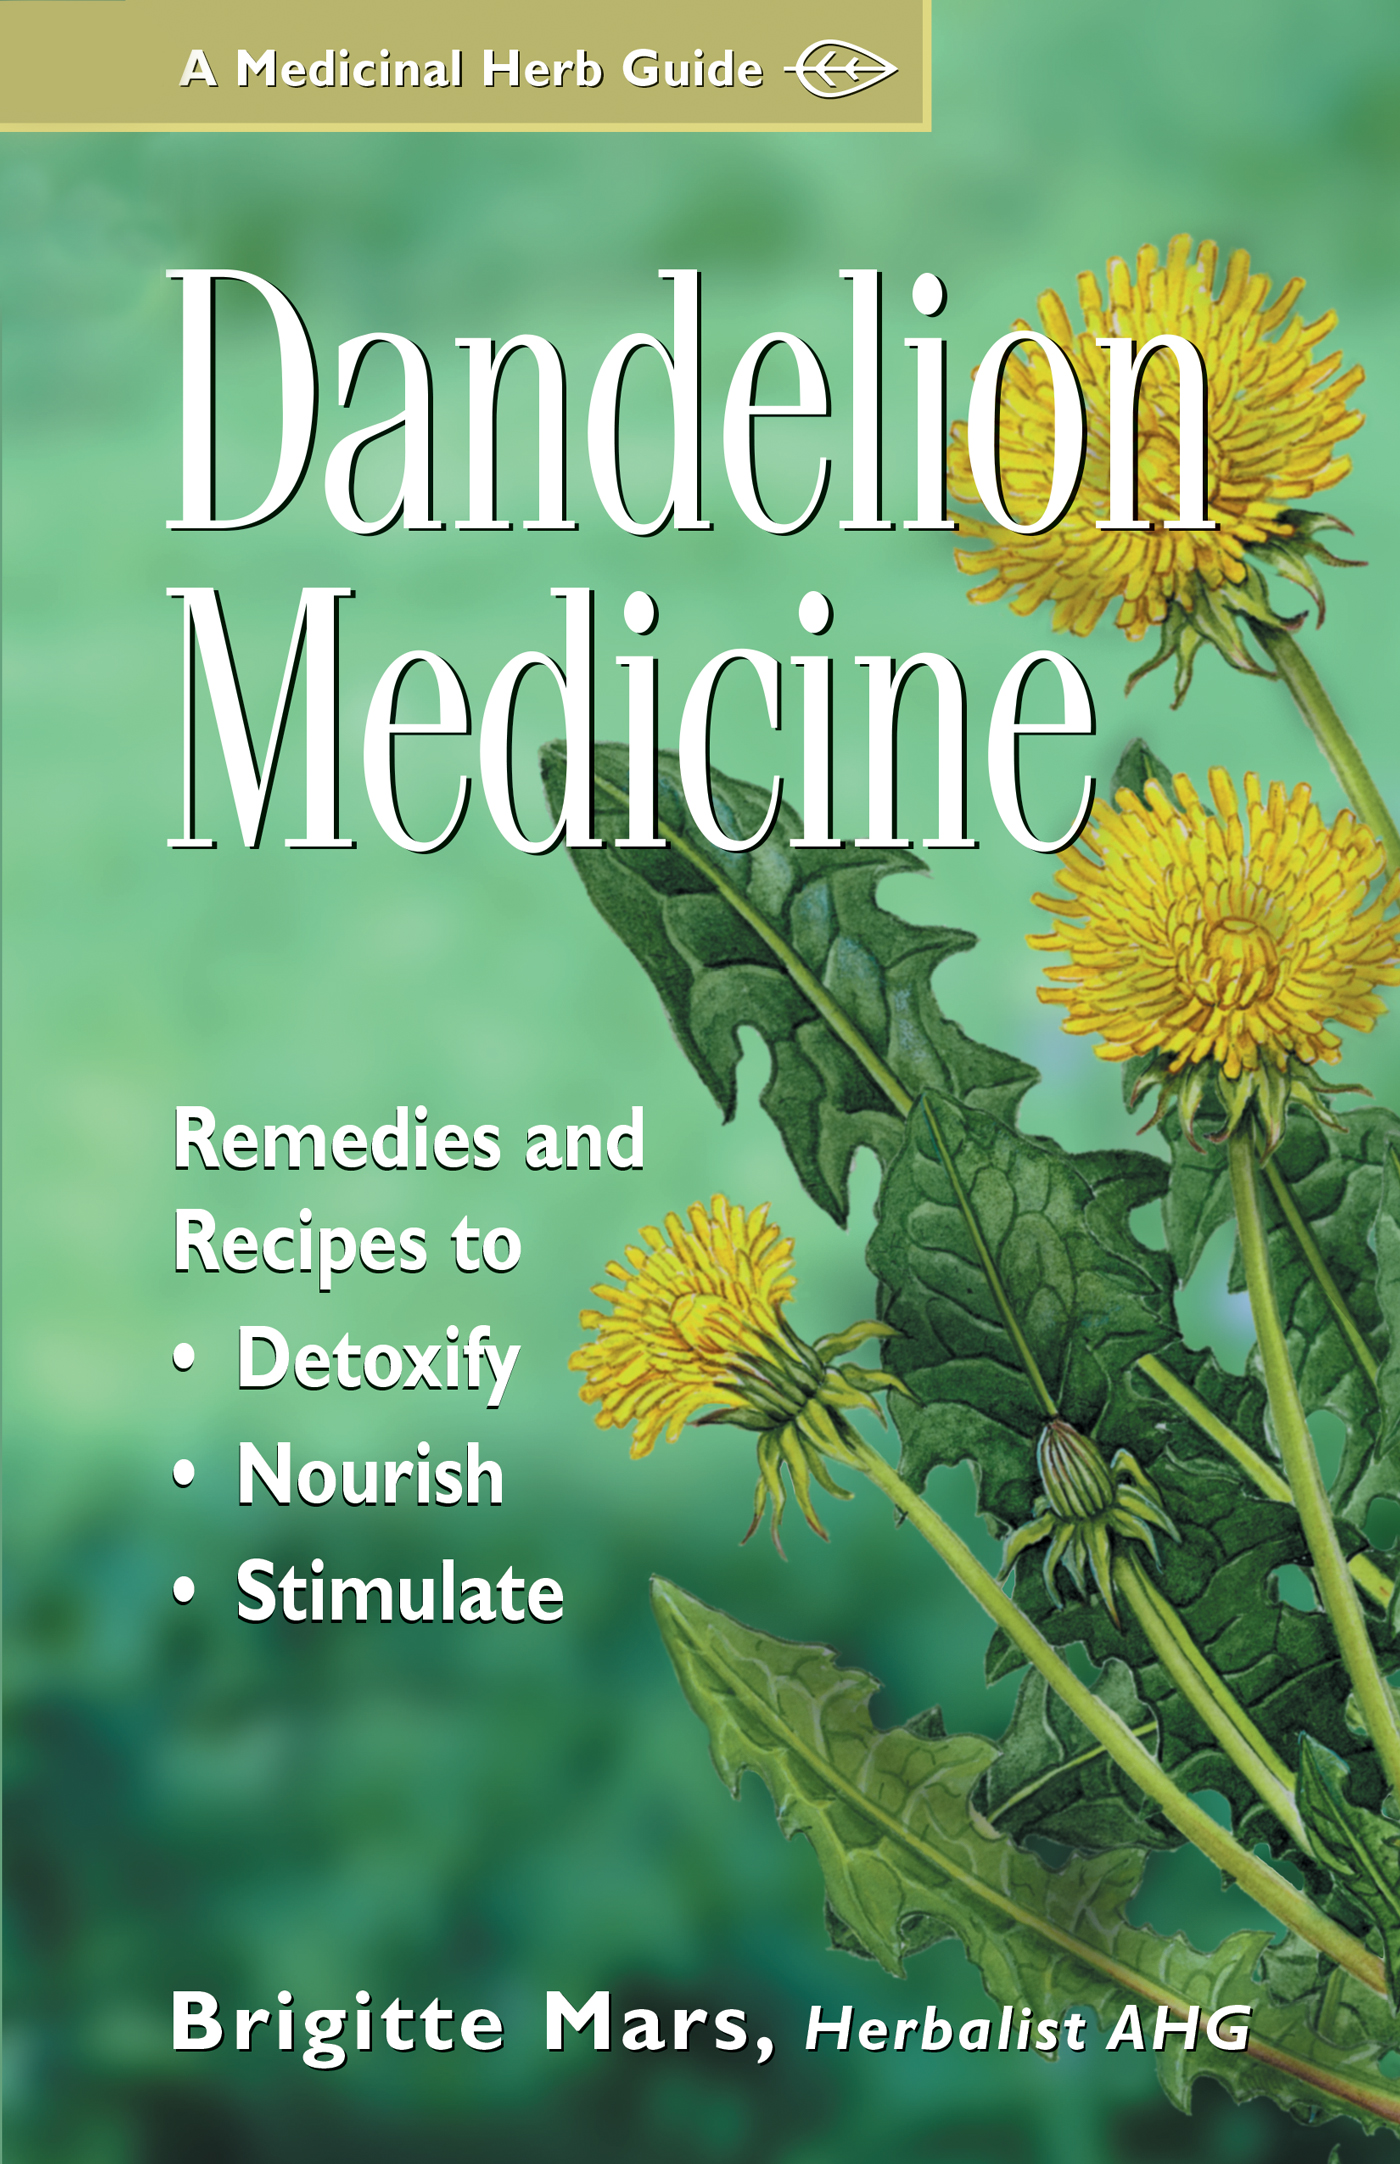 Dandelion Medicine Remedies and Recipes to Detoxify, Nourish, and Stimulate - Brigitte Mars